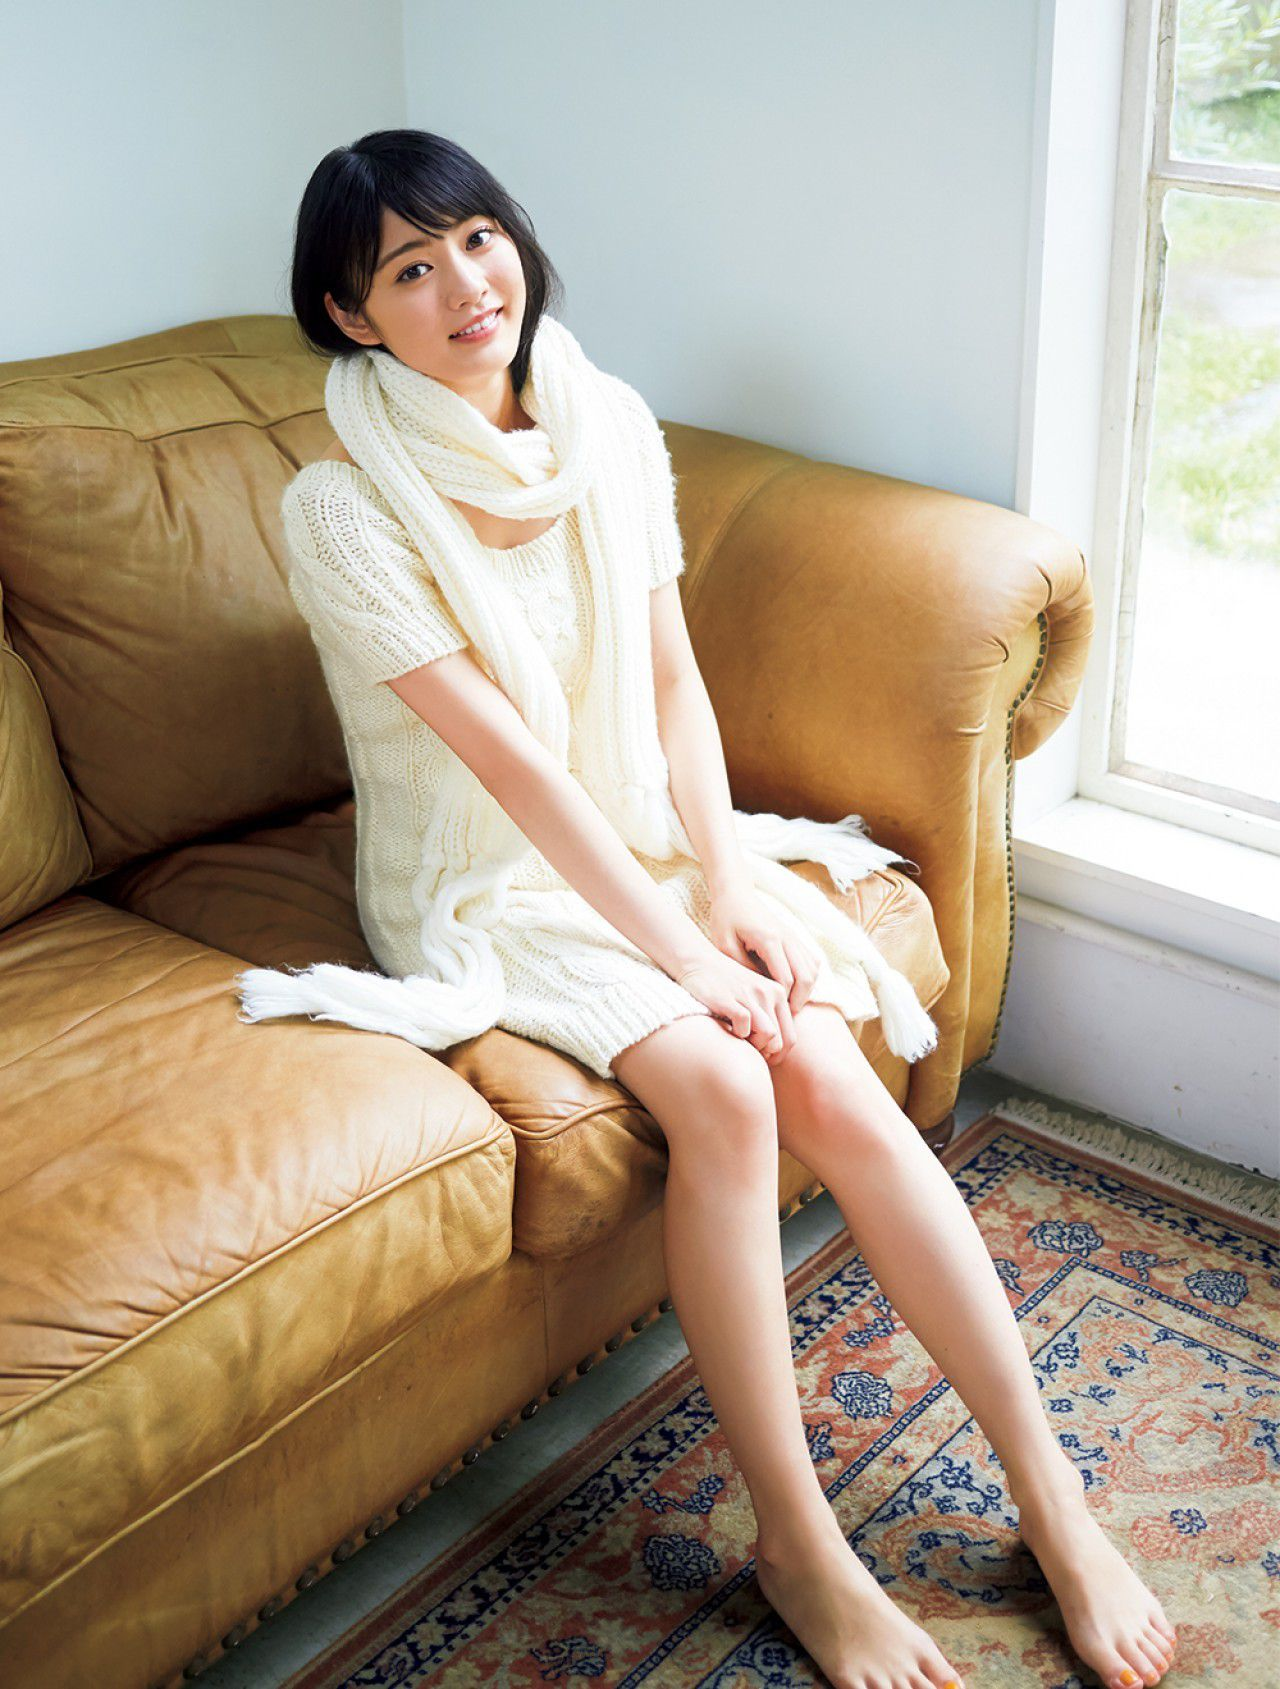 Yasuko Koga, a pure and innocent girl from The Last Idol004